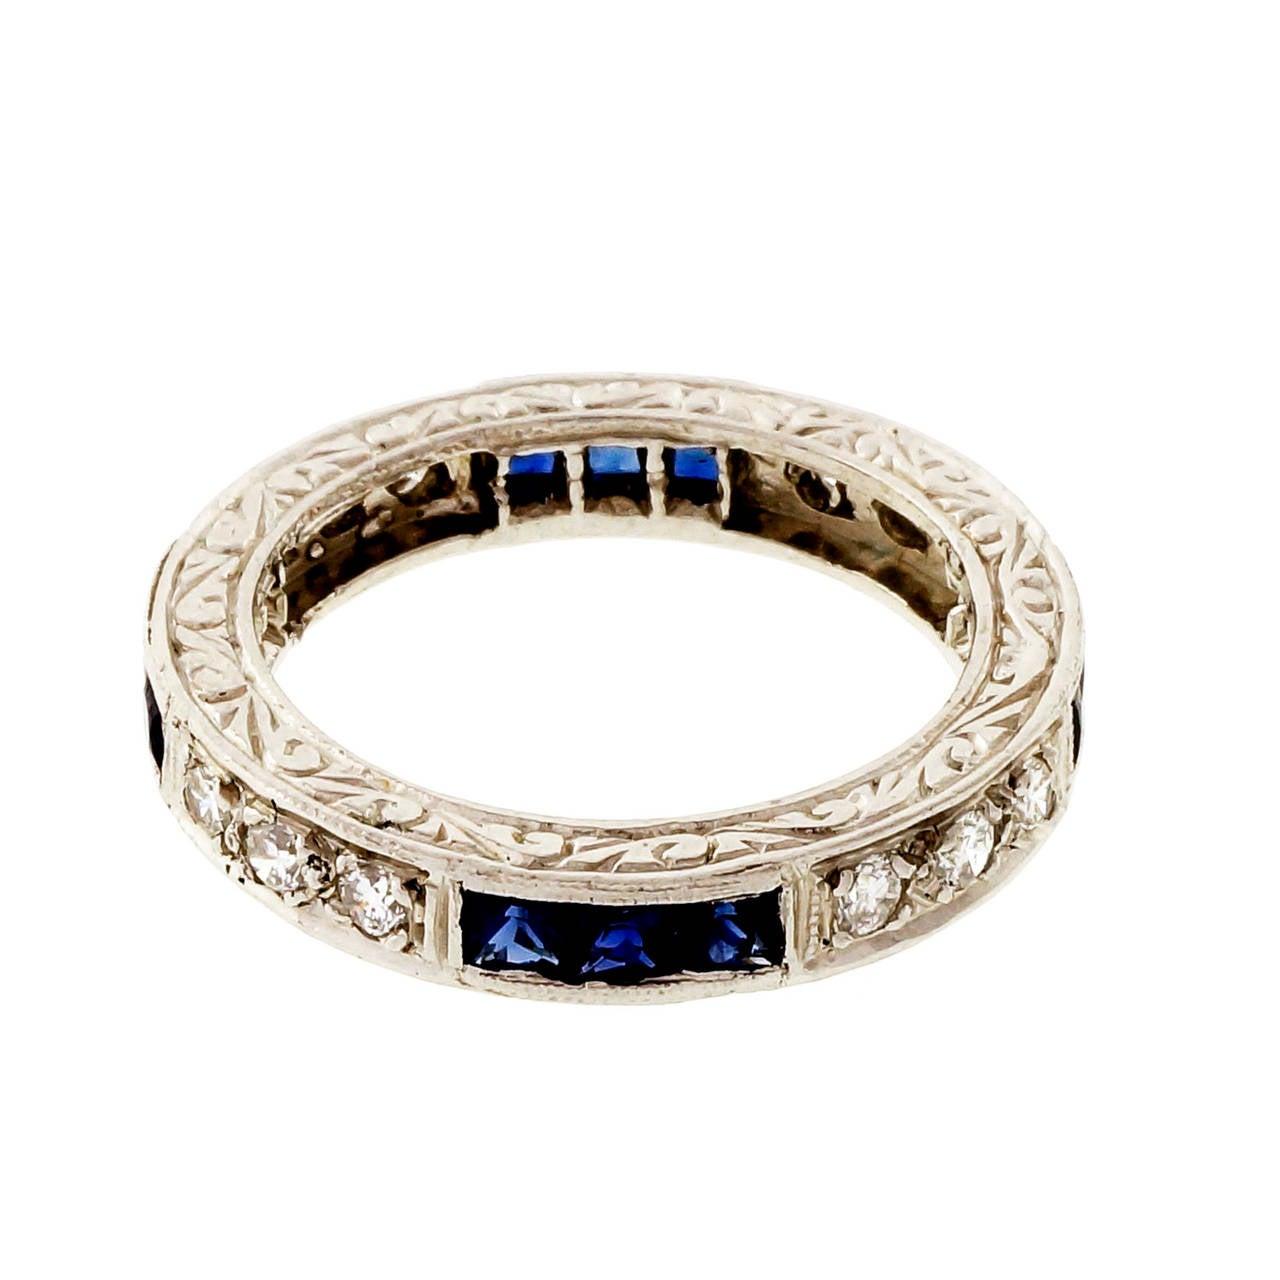 Peter Suchy Sapphire Round Diamond Platinum Eternity Band Ring 6